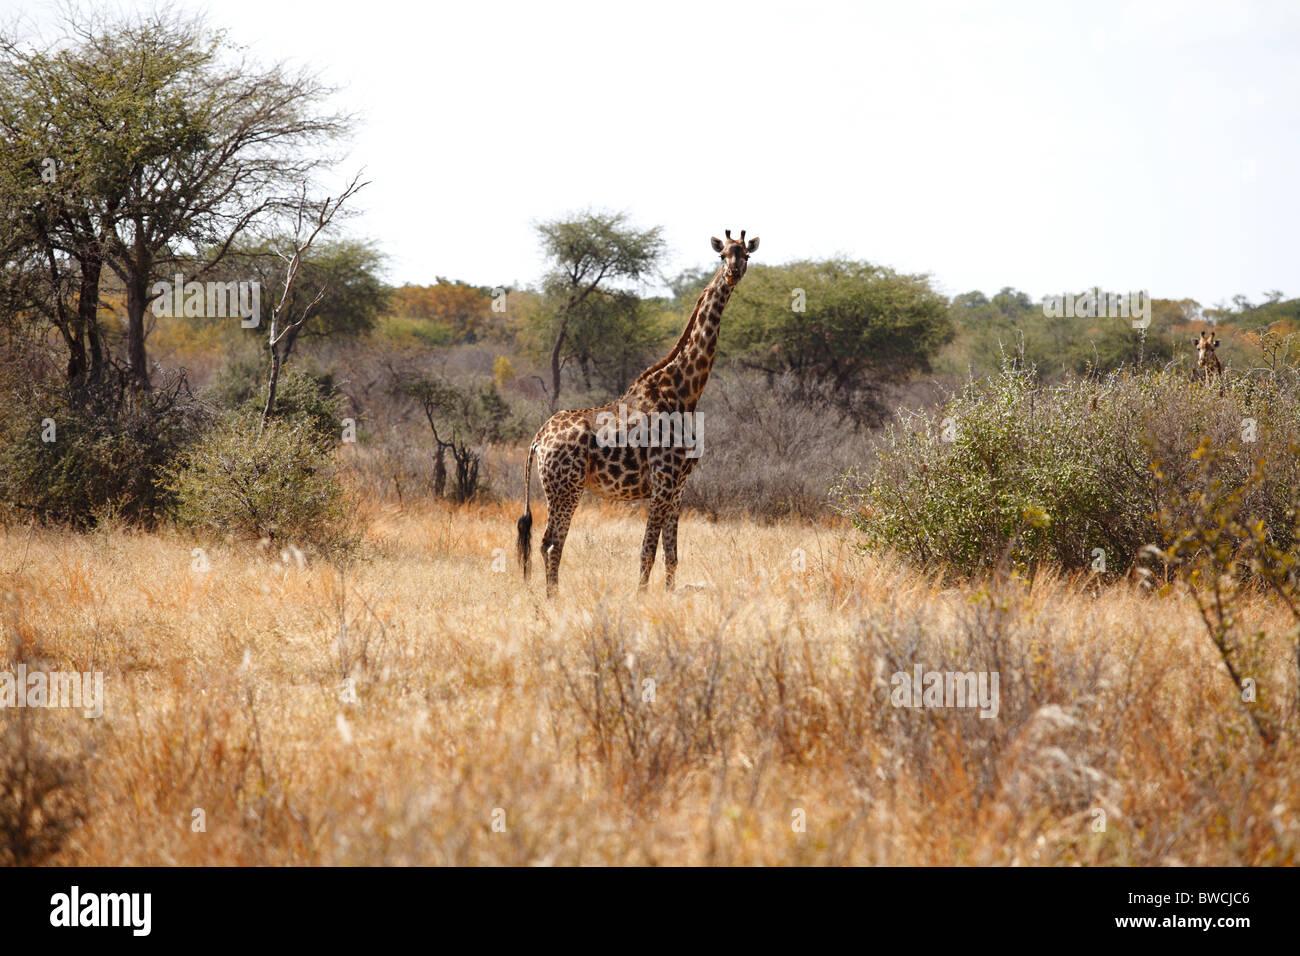 Giraffe in Hwange National Park, Zimbabwe Stock Photo